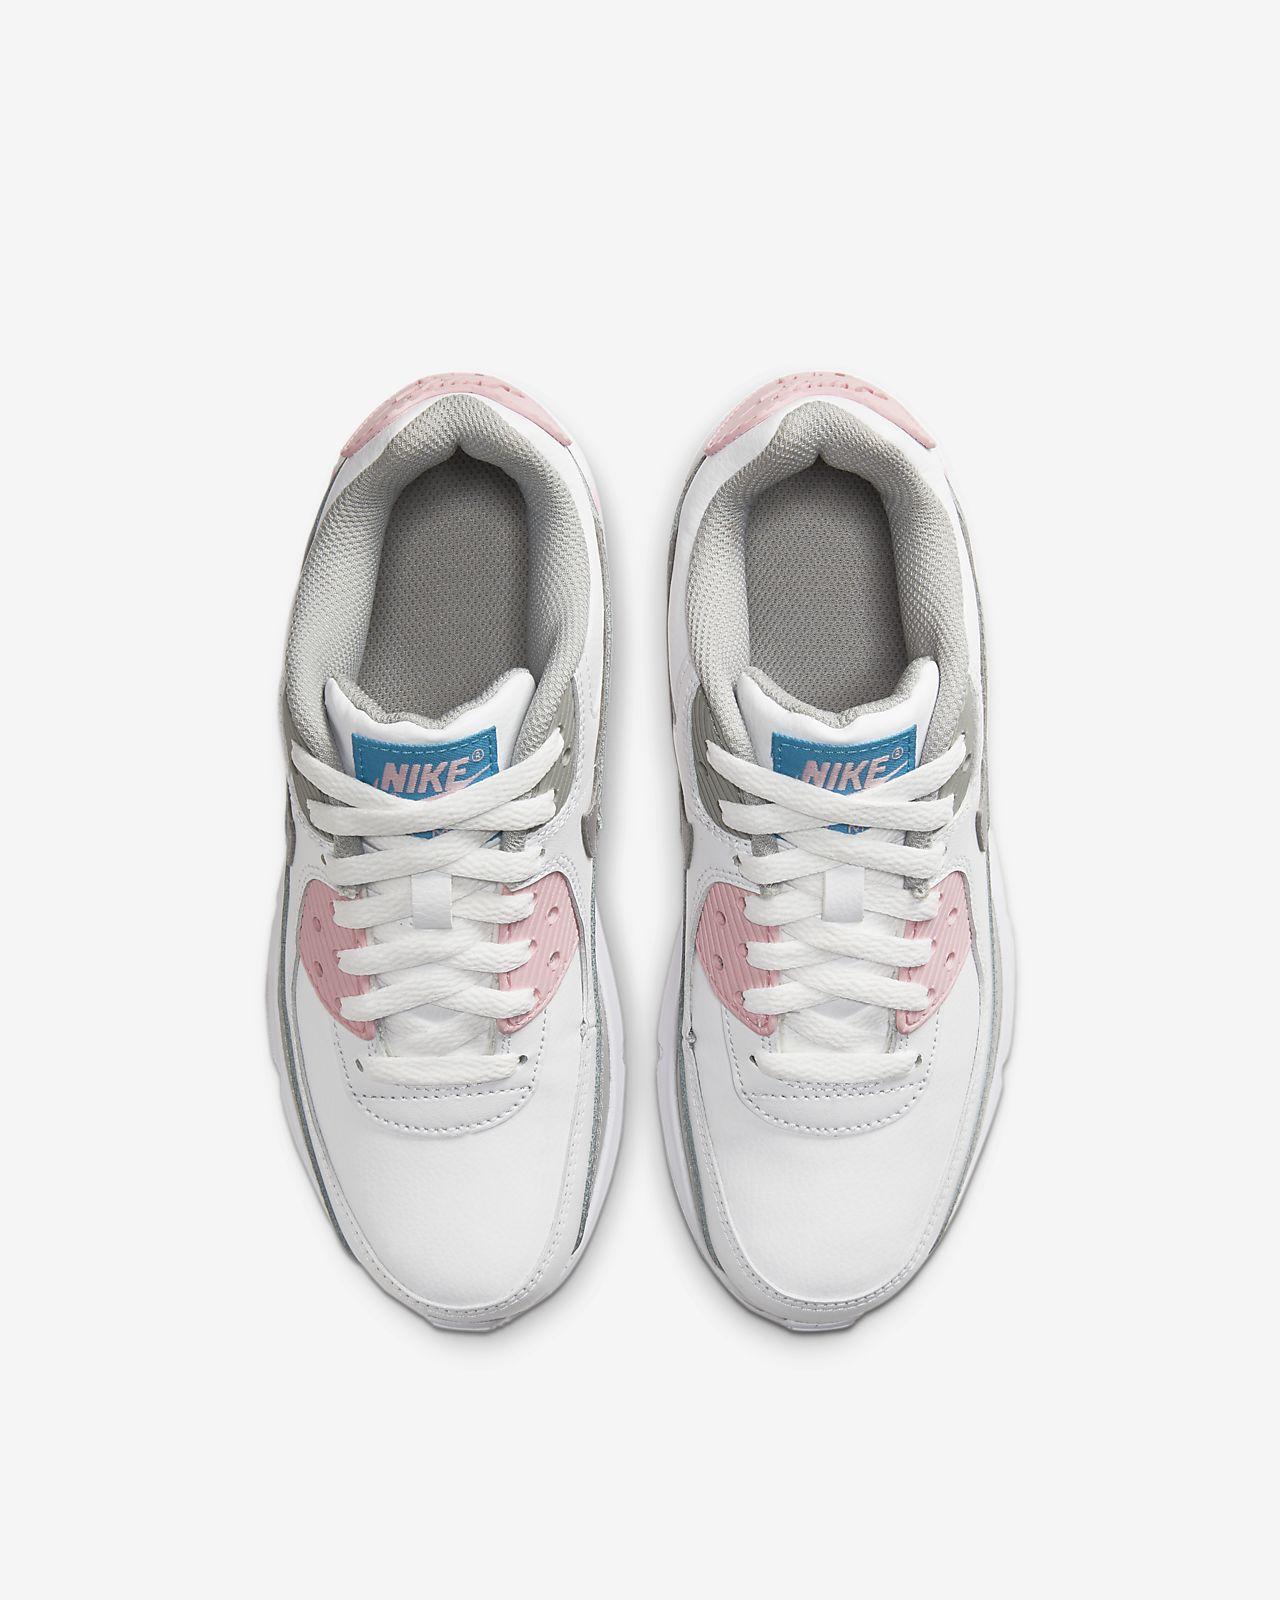 Scarpa Nike Air Max 90 LTR Ragazzi